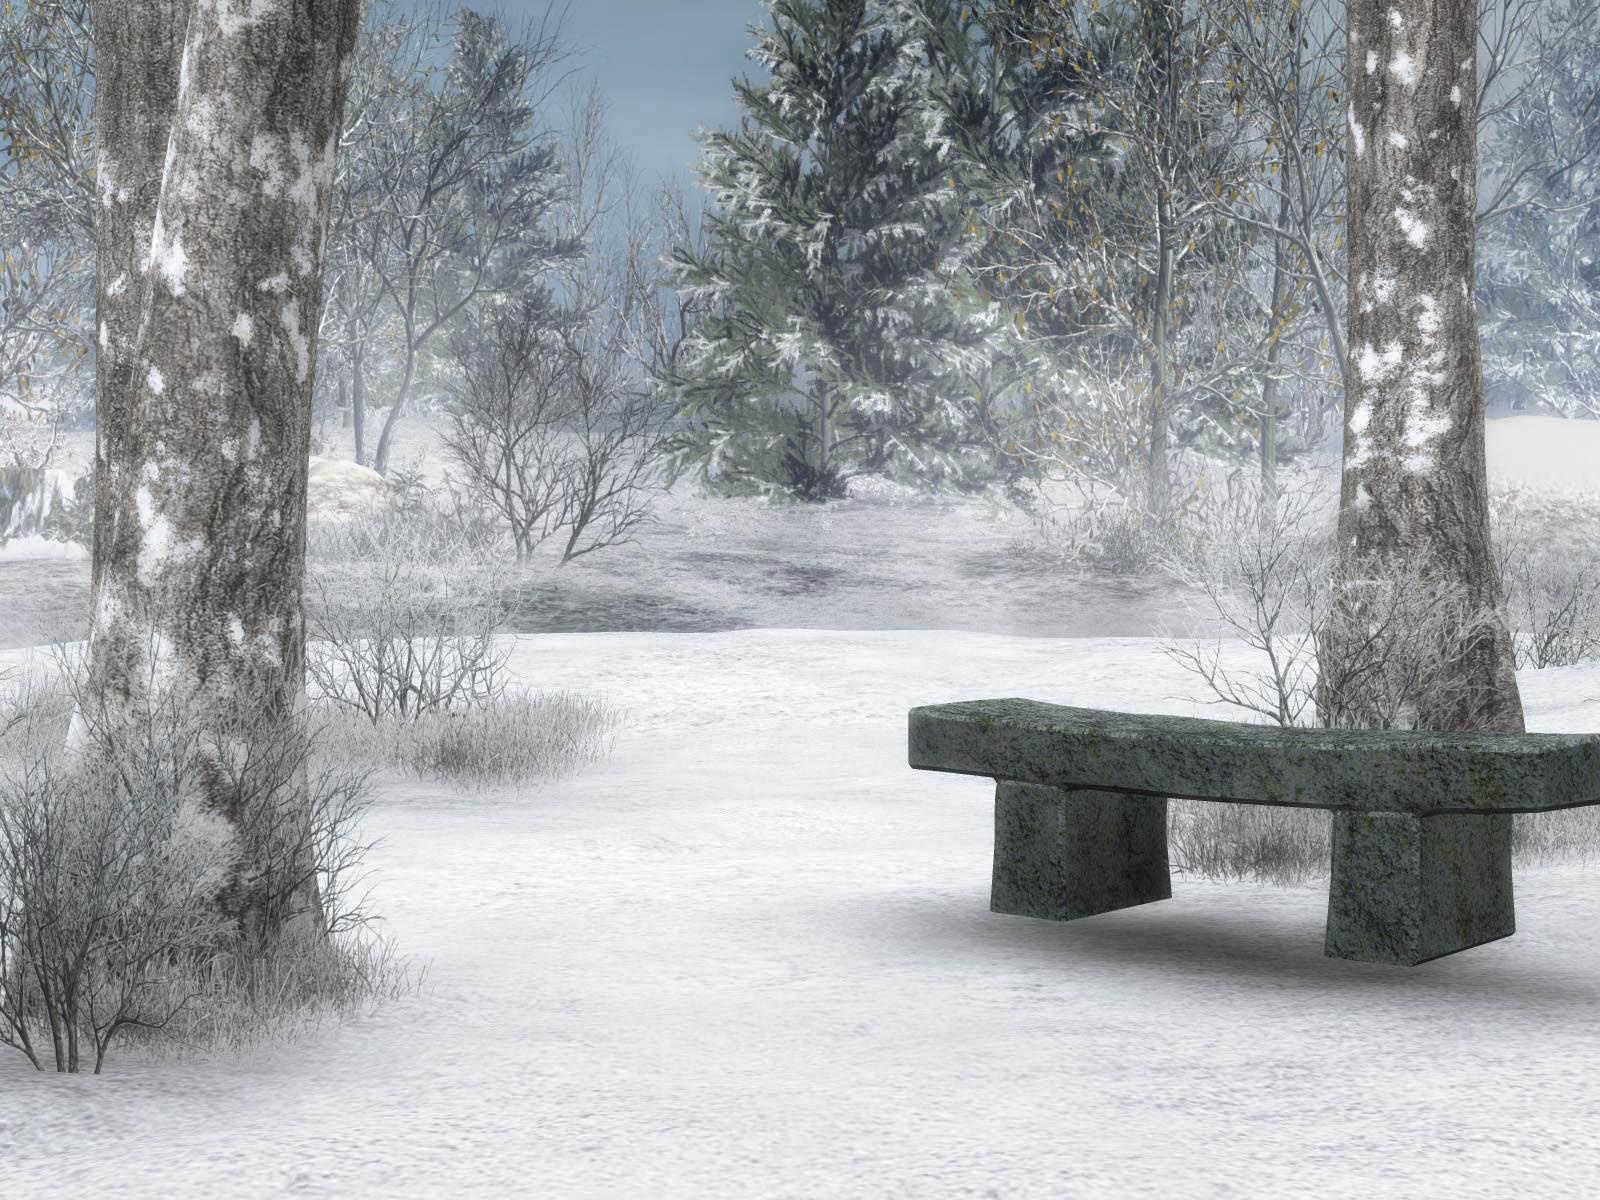 winter scene desktop wallpaper 2017 - Grasscloth Wallpaper